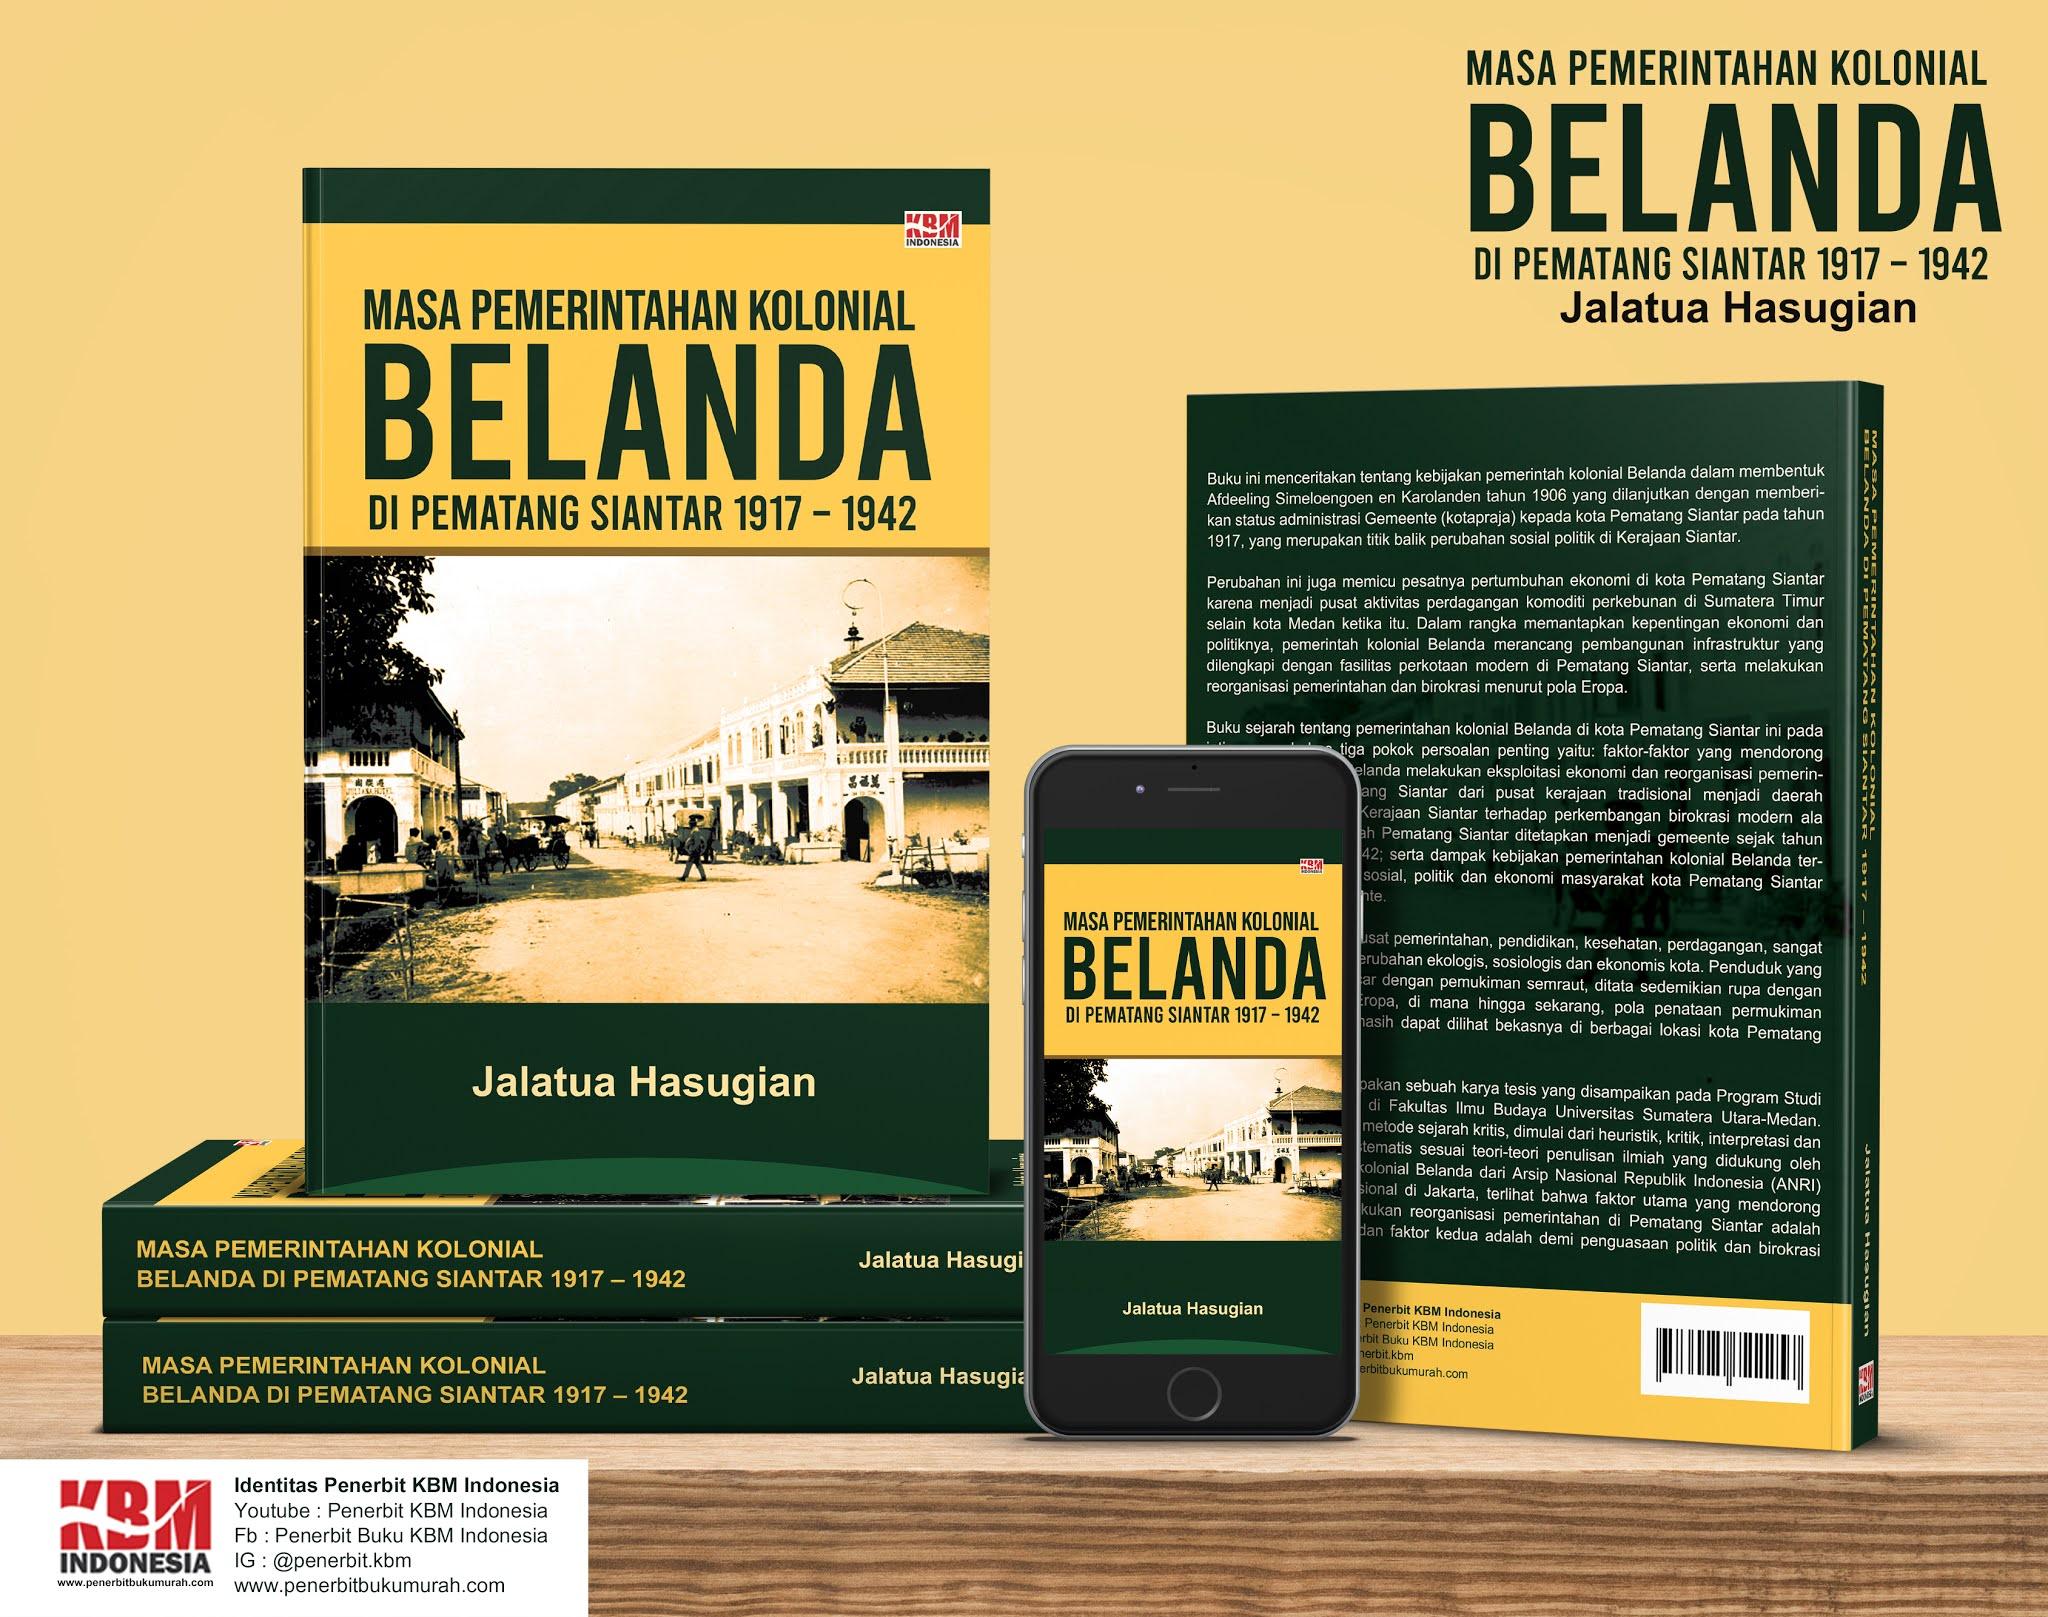 MASA PEMERINTAHAN KOLONIAL BELANDA DI PEMATANG SIANTAR 1917 – 1942